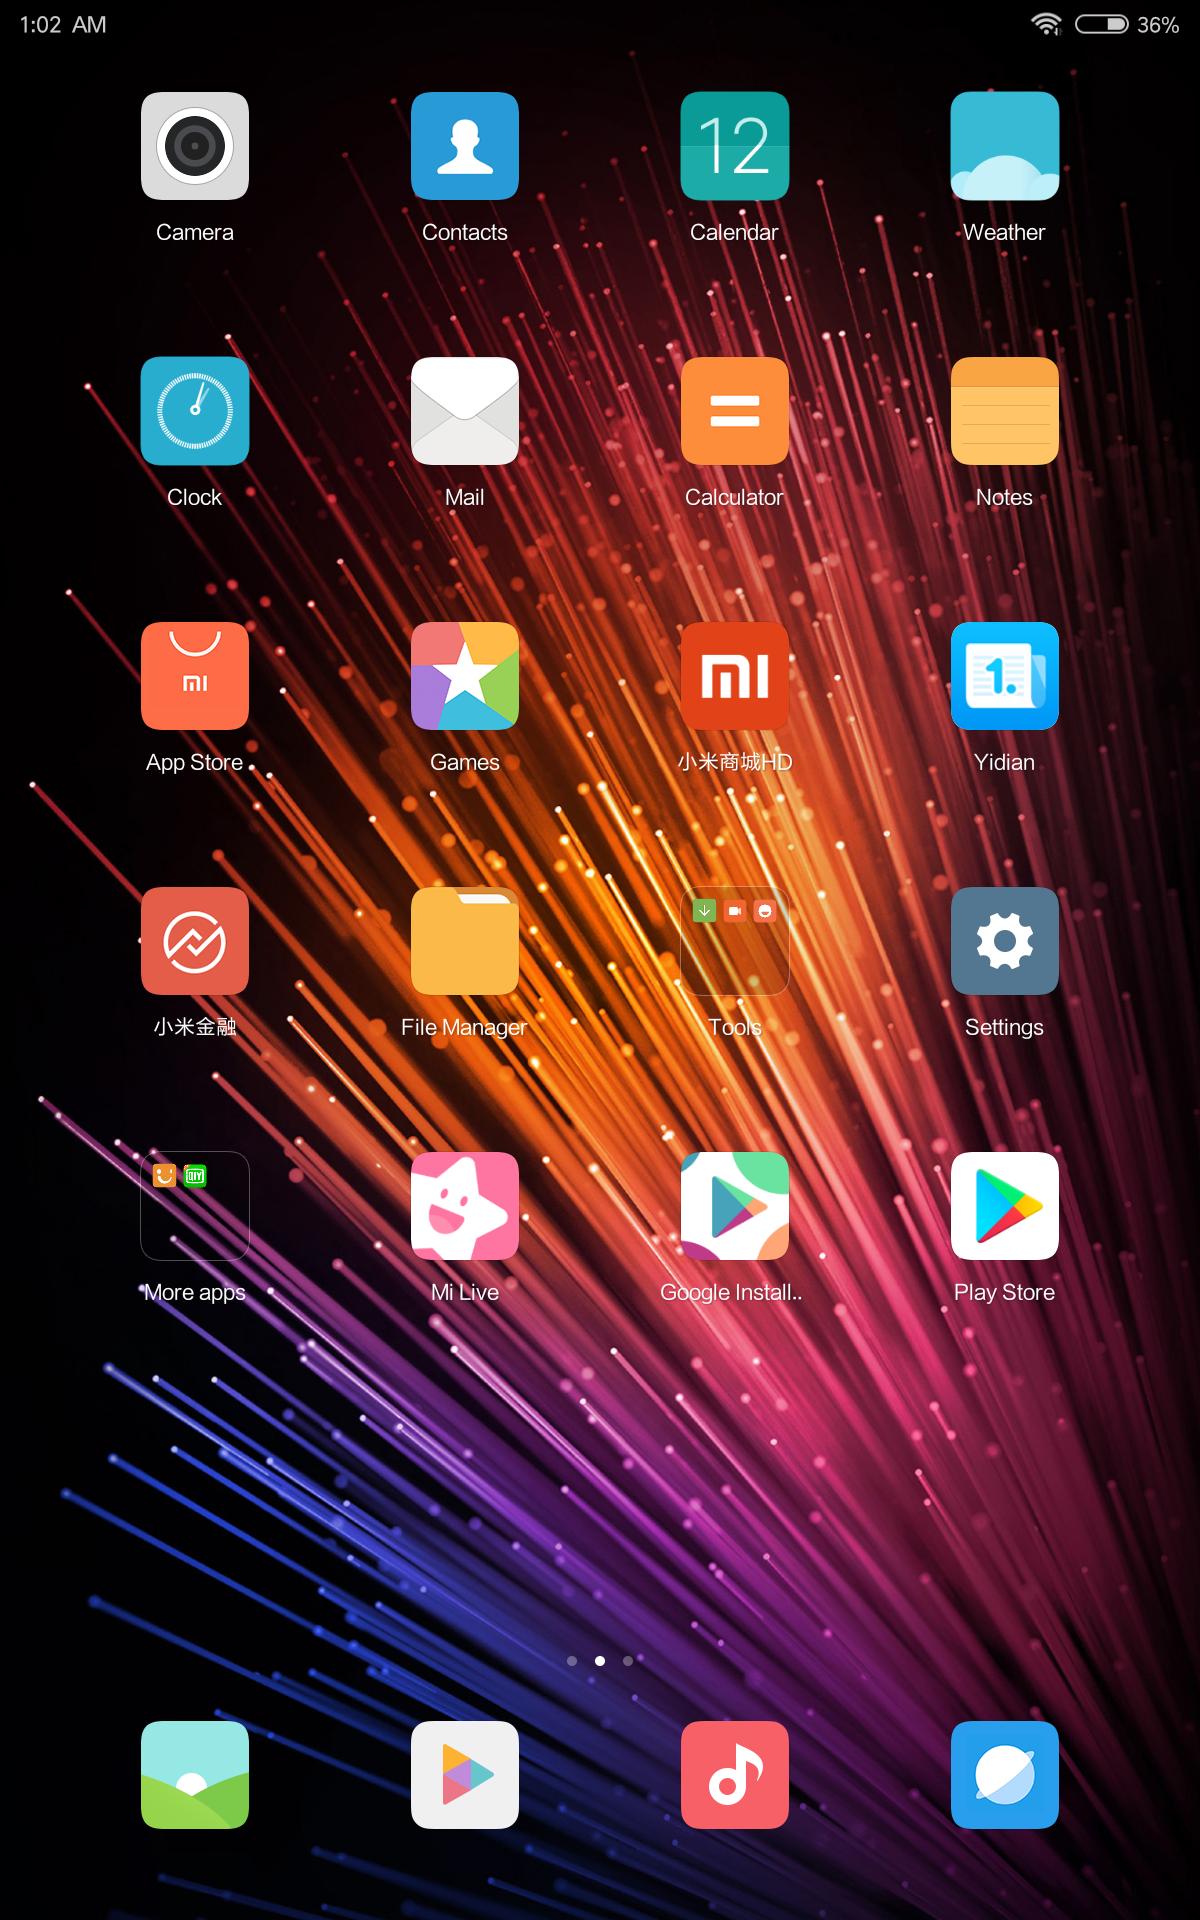 Xiaomi Mi Pad 4 Testbericht 8 Zoll Tablet MIUI Android 3